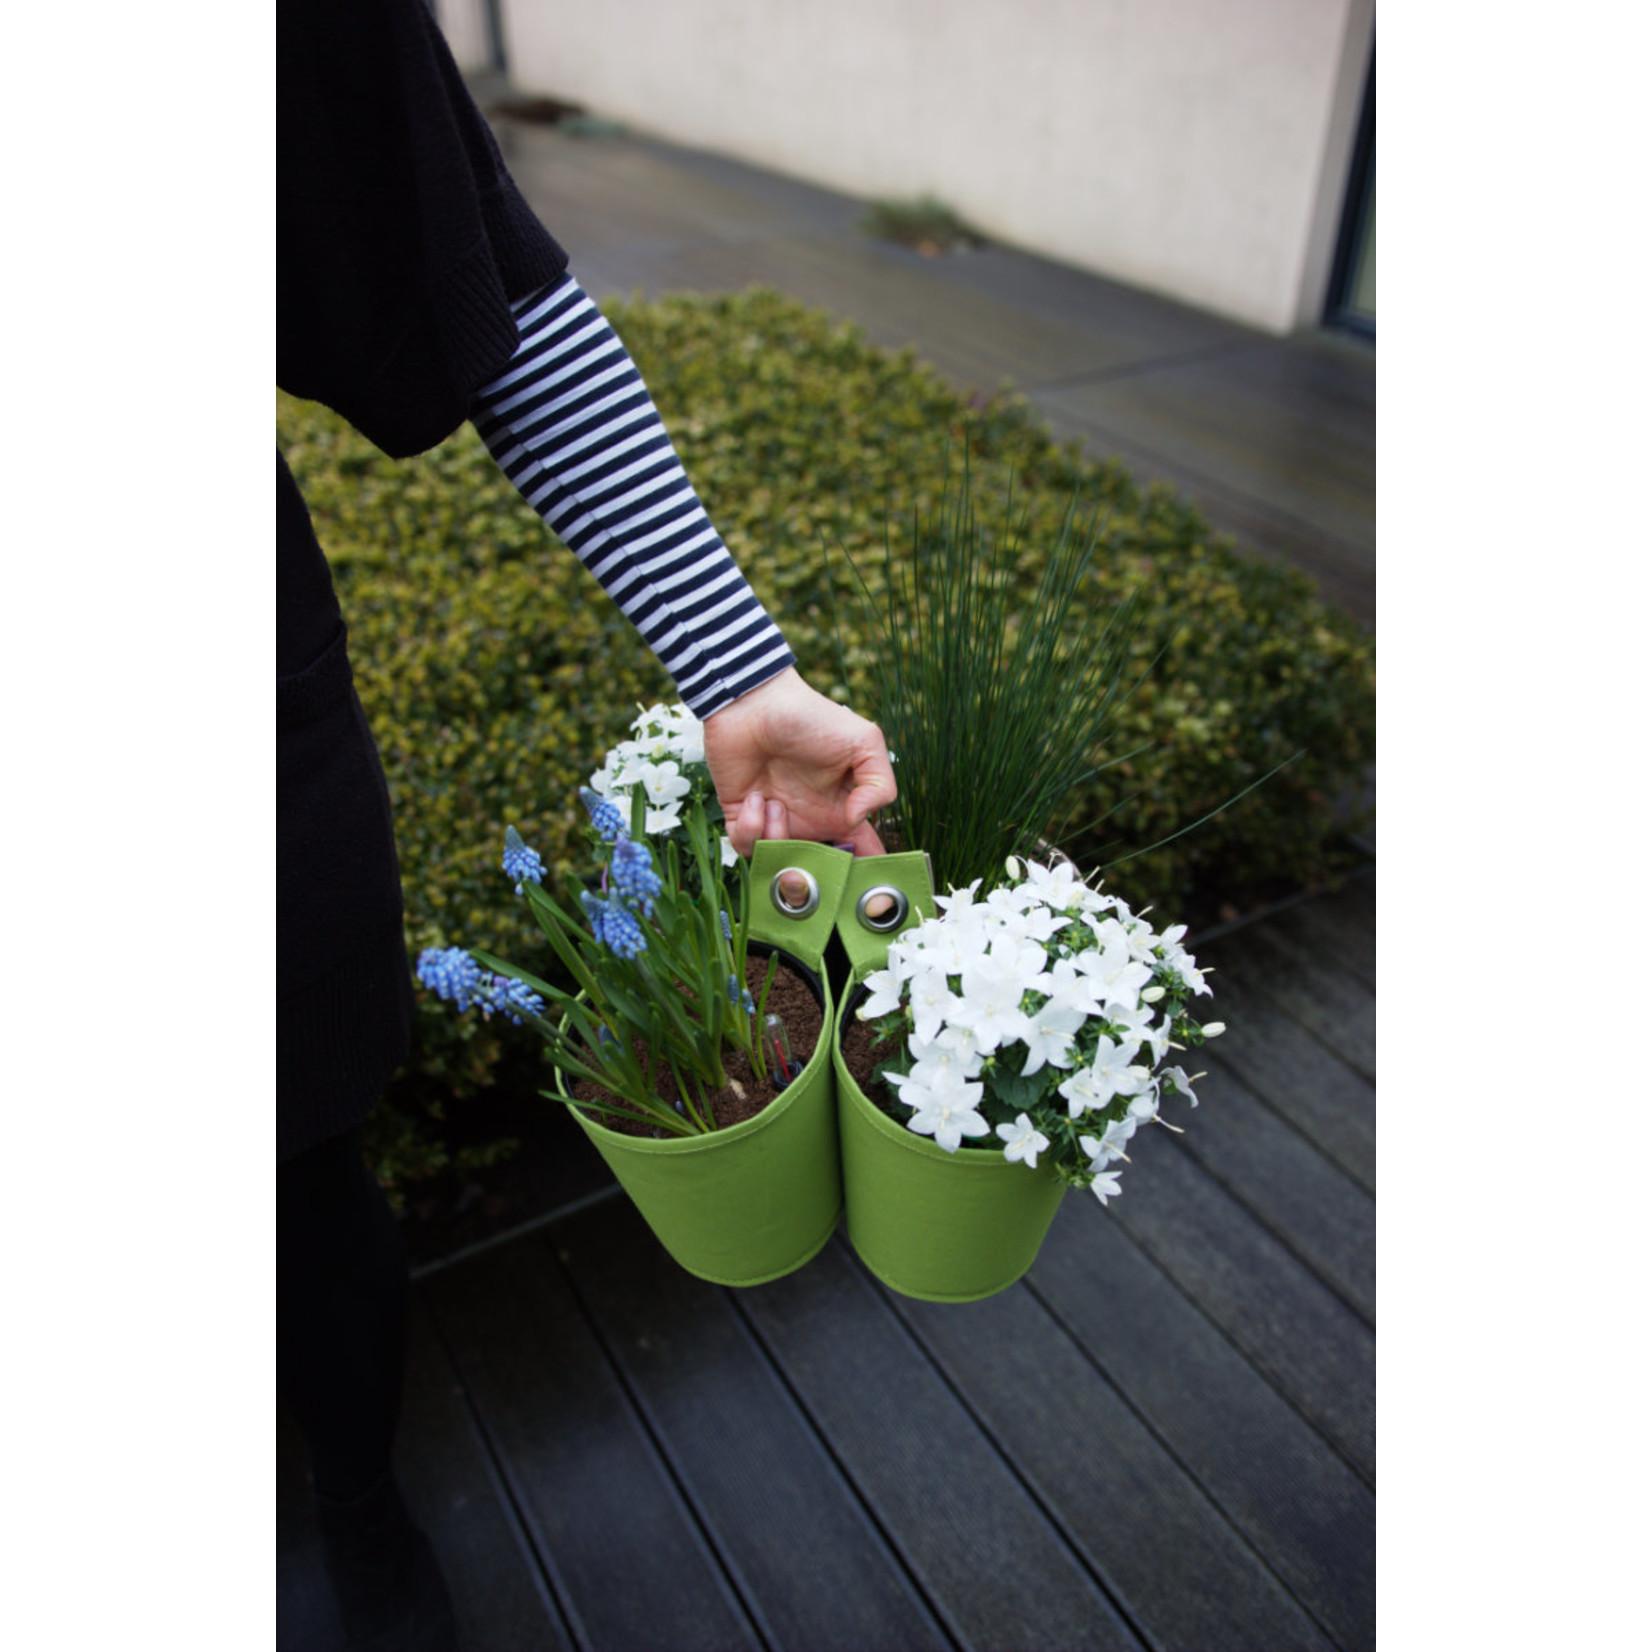 The green pot Spring Green